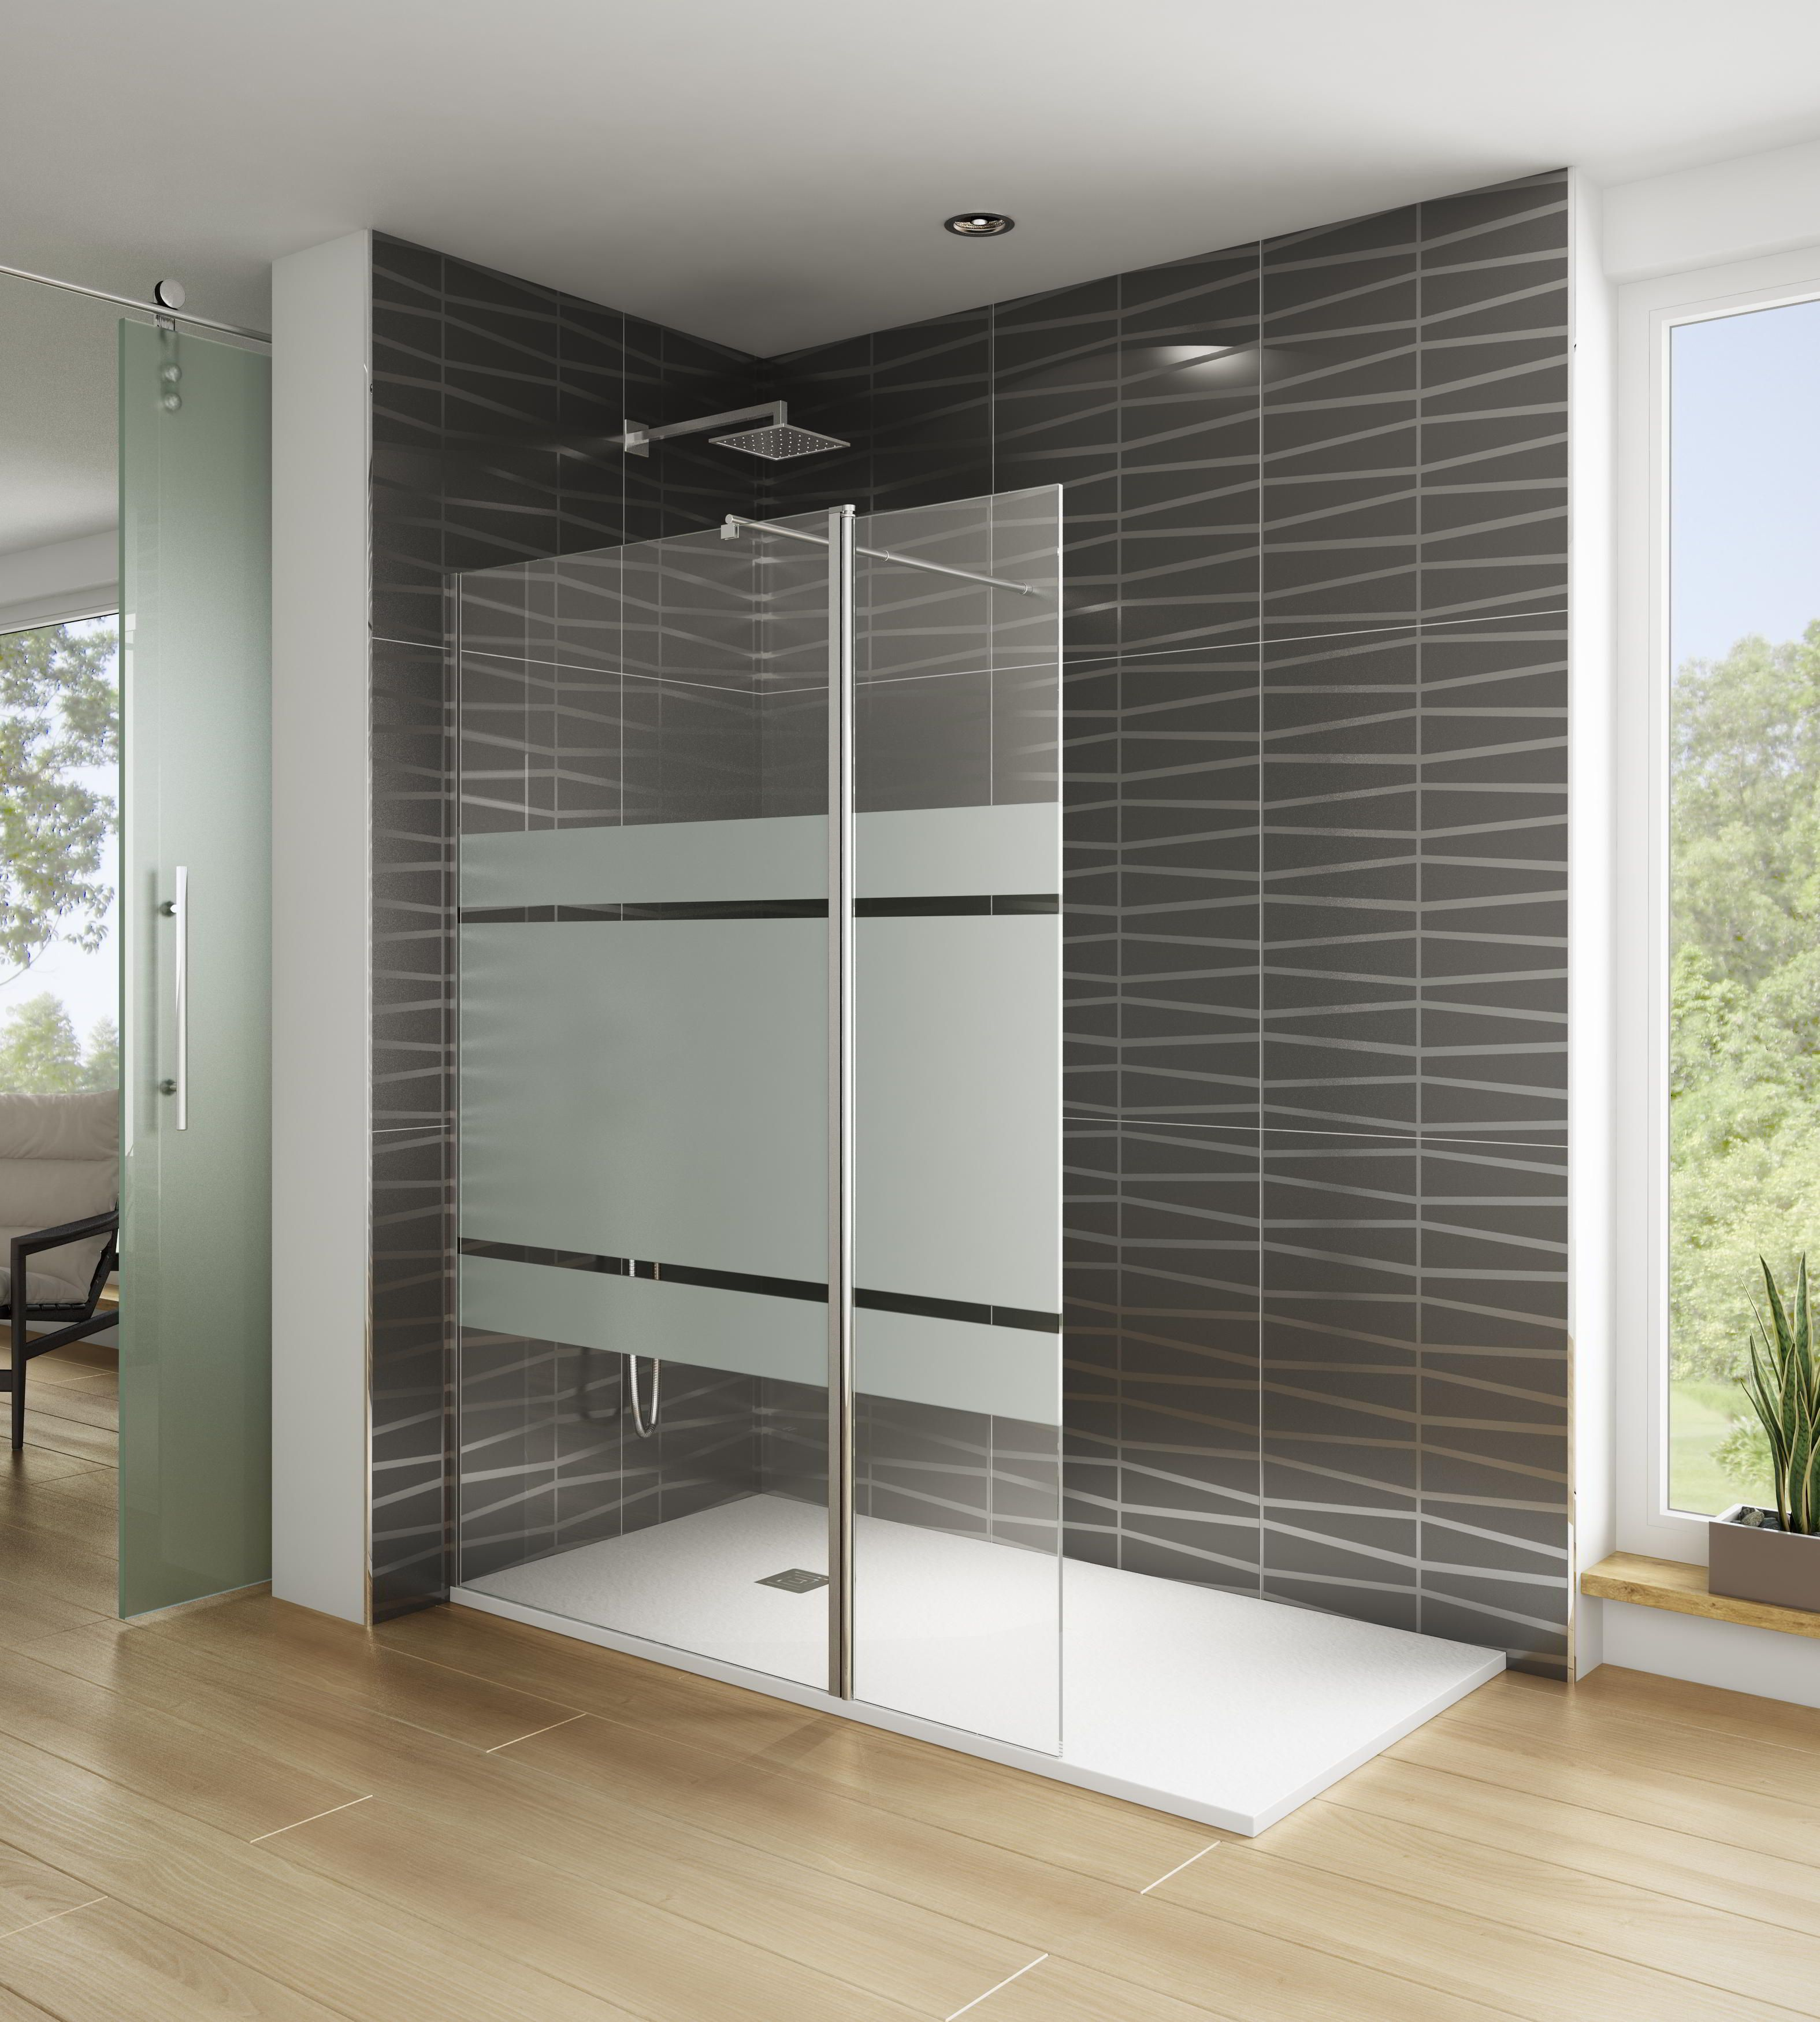 Mampara de ducha modelo screen abatible de 40 cm con - Mampara cristal ducha ...